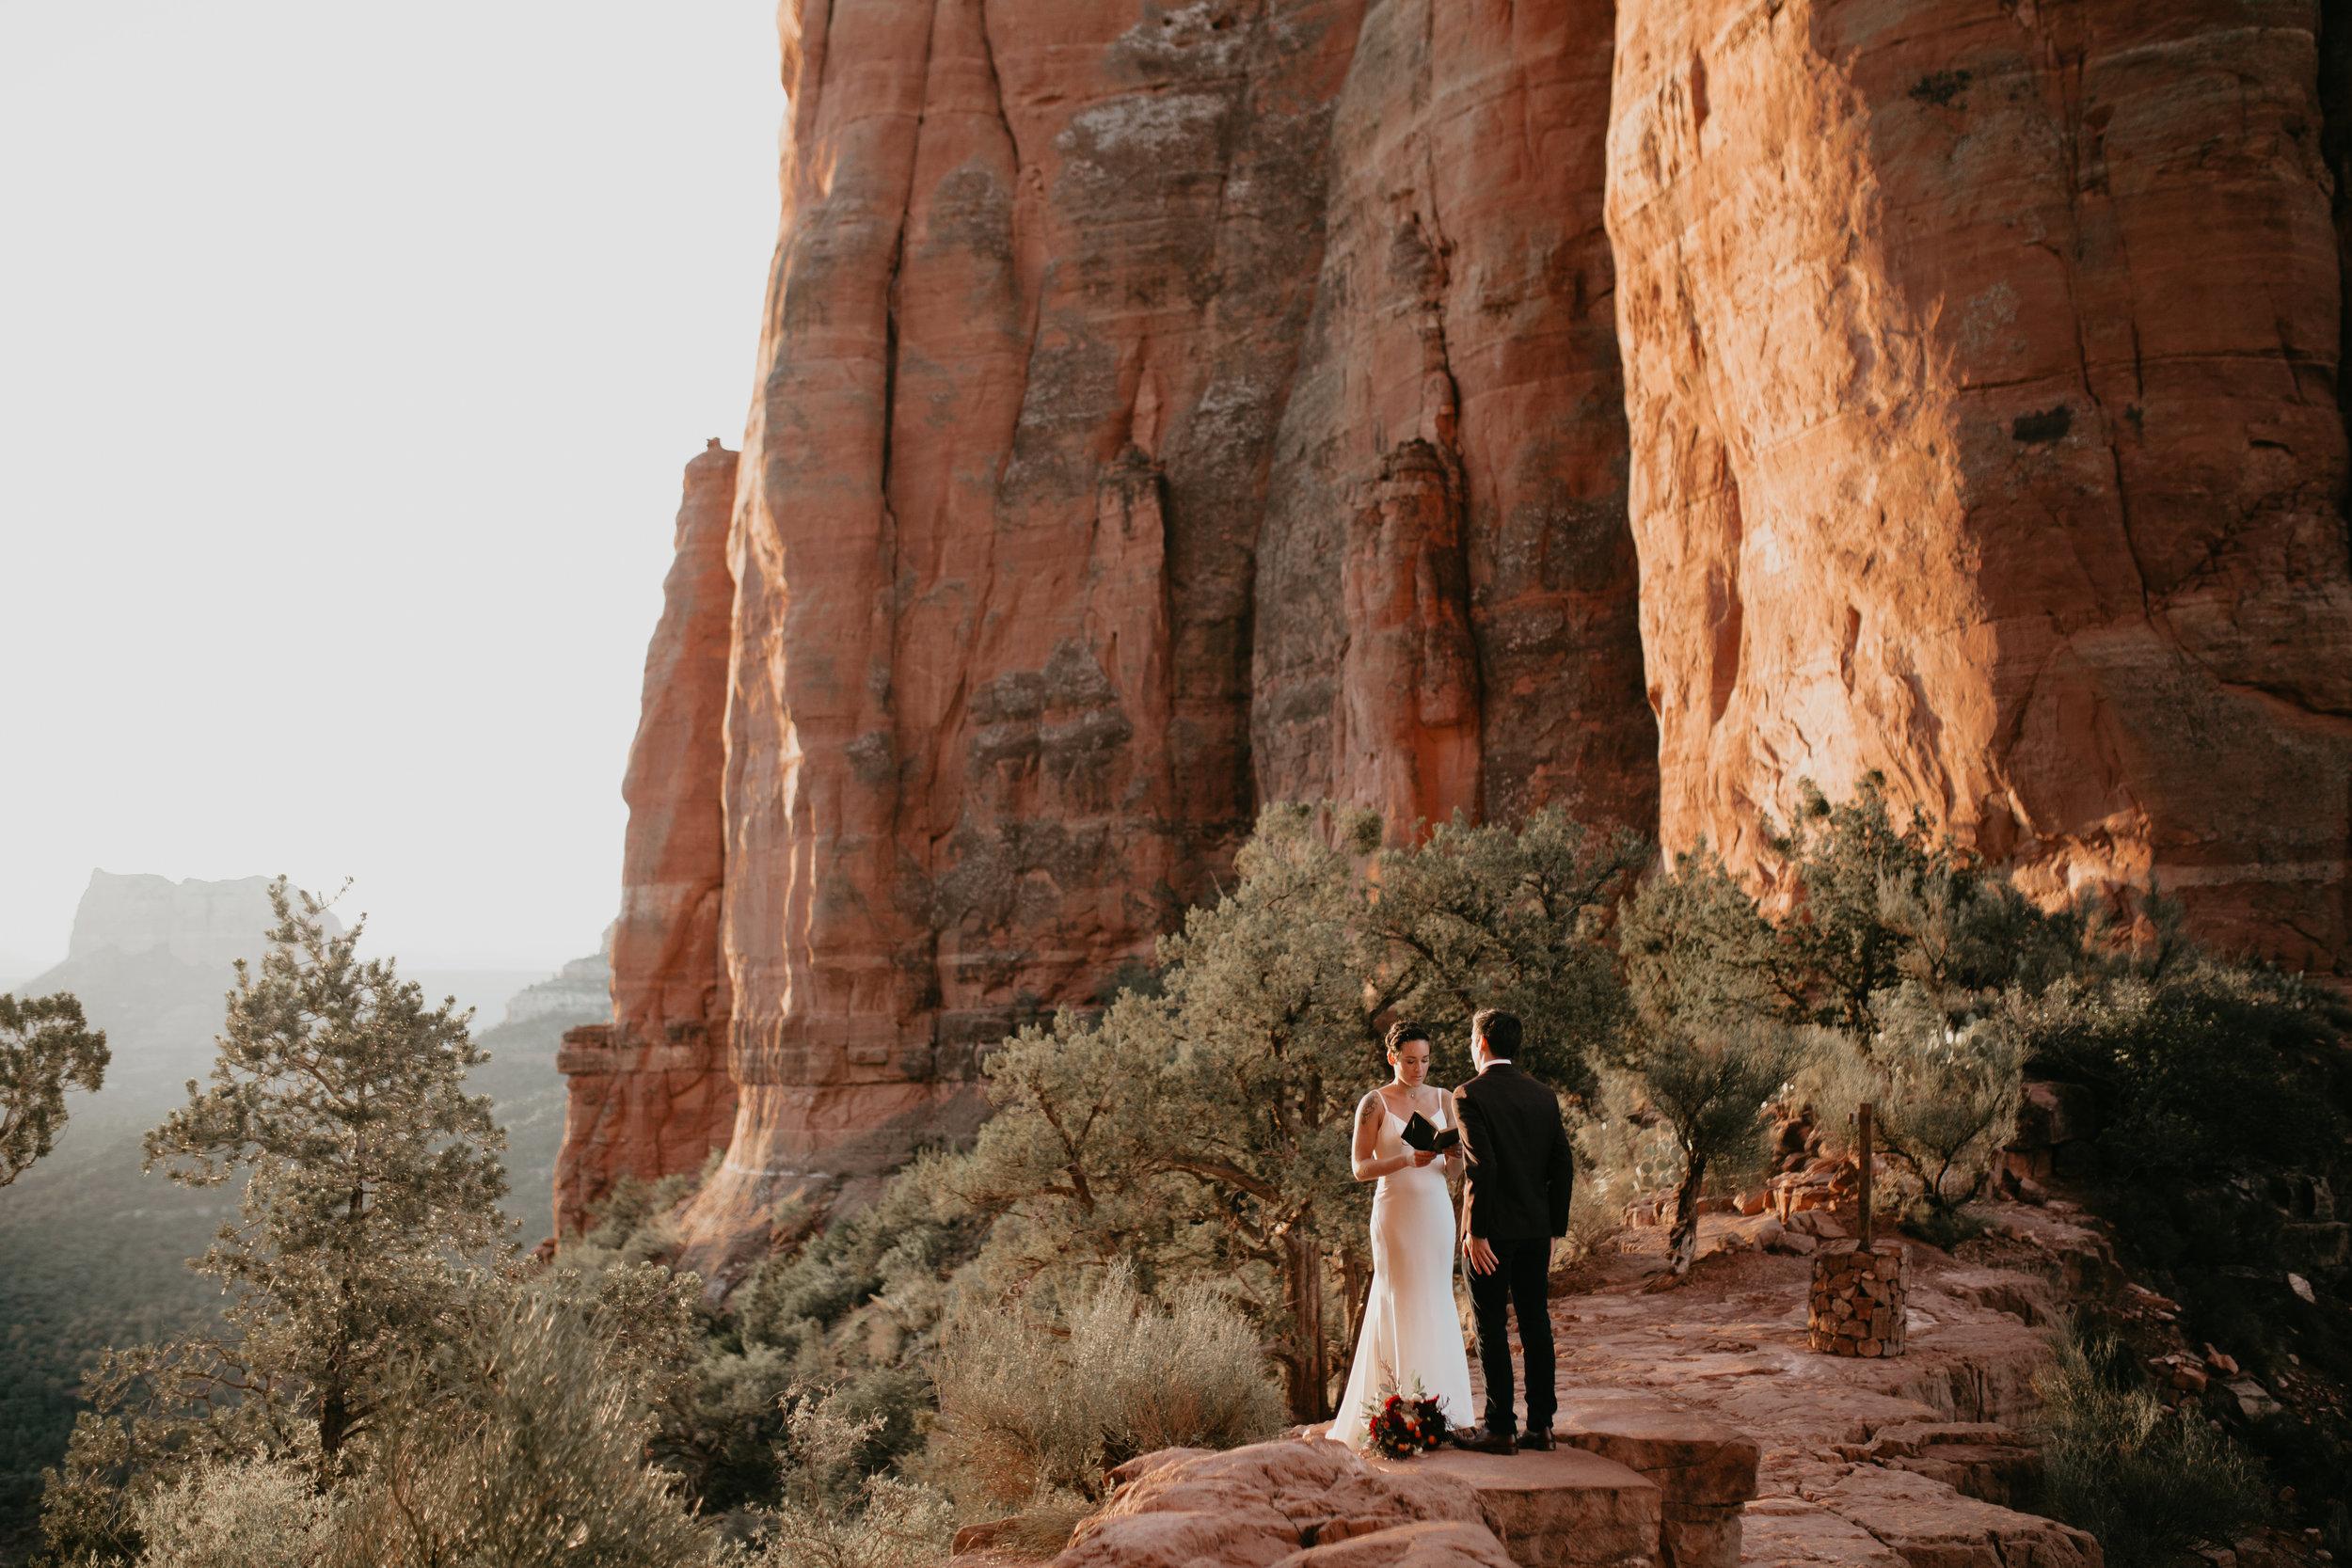 nicole-daacke-photography-sedona-arizona-destination-elopement-wedding-photographer-catherdral-rock-hiking-elopement-sedona-river-elopement-photos-desert-rock-wedding-photographer-laid-back-spontaneous-elopement-42.jpg